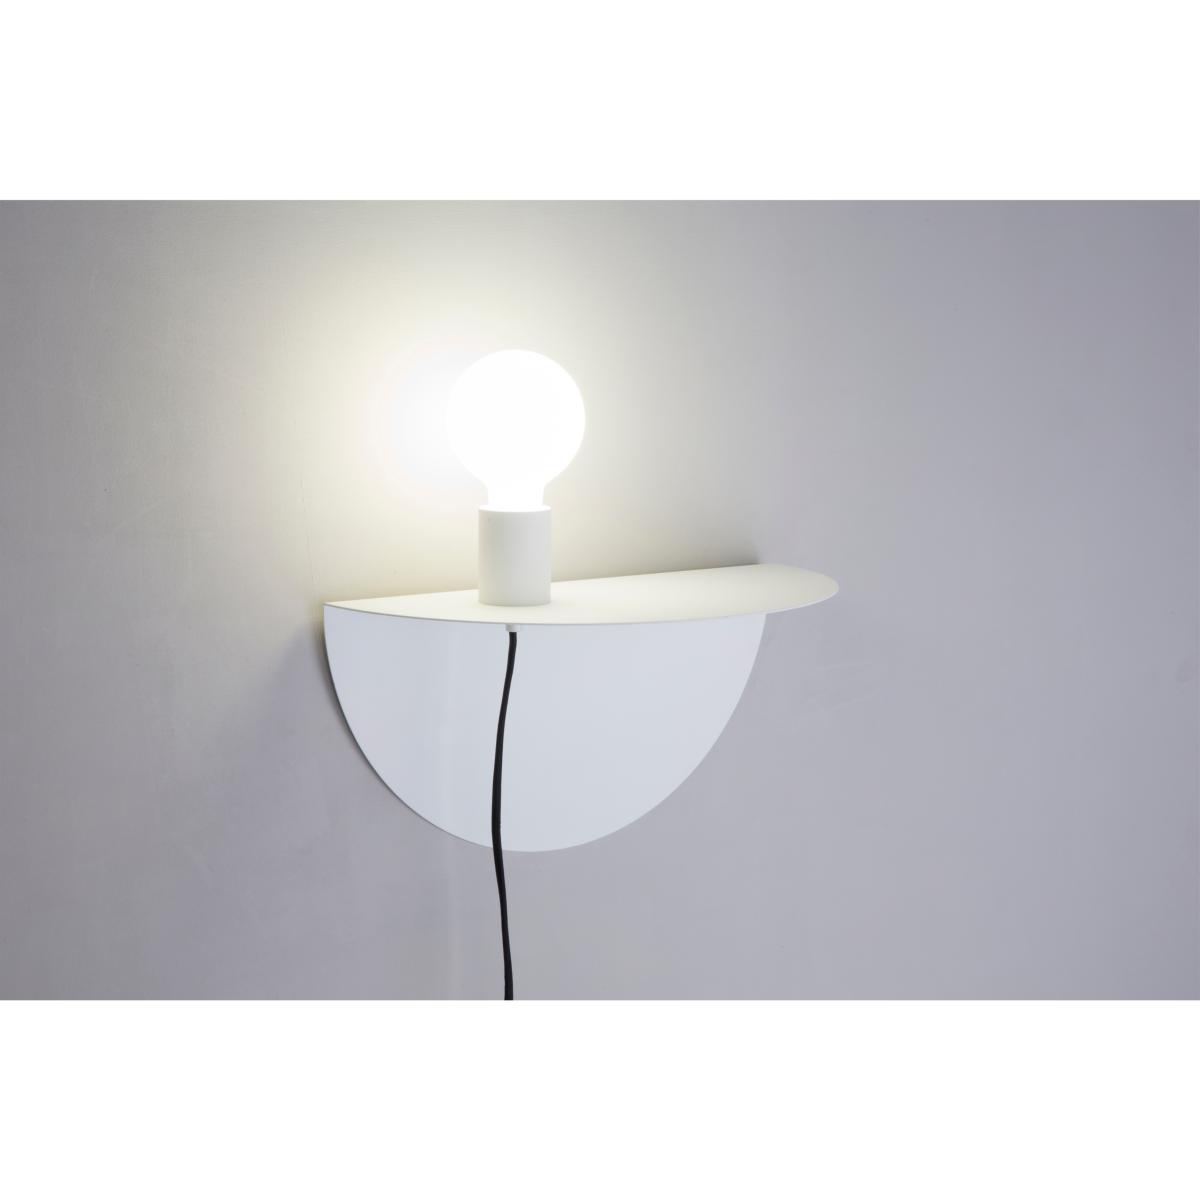 Applique Table De Chevet Blanche Nit Faro 01005